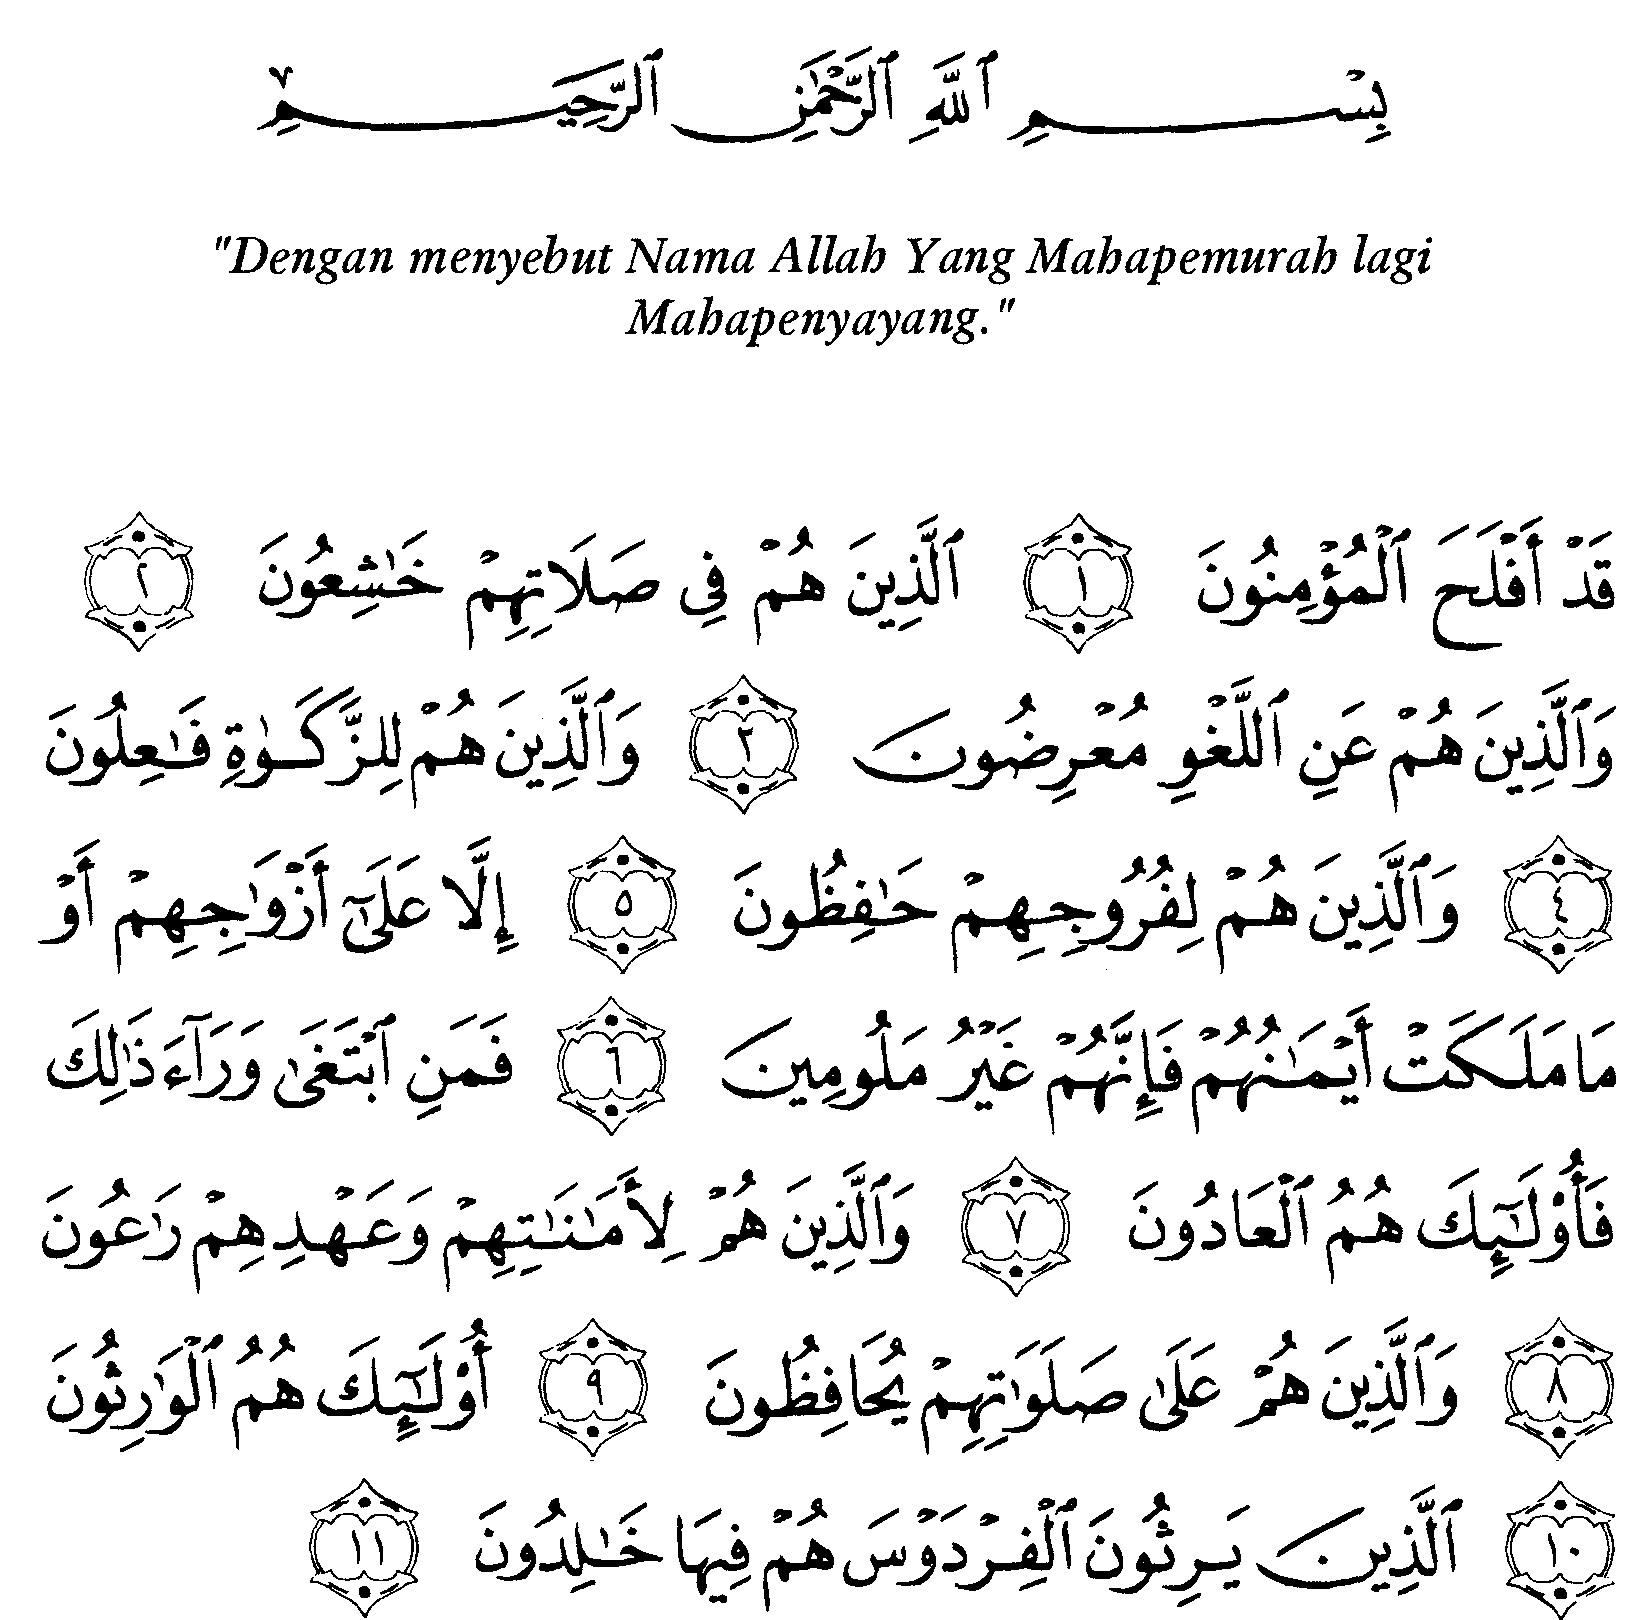 Tafsir Ibnu Katsir Surah Al Muminuun Ayat 1 11 Alquranmulia